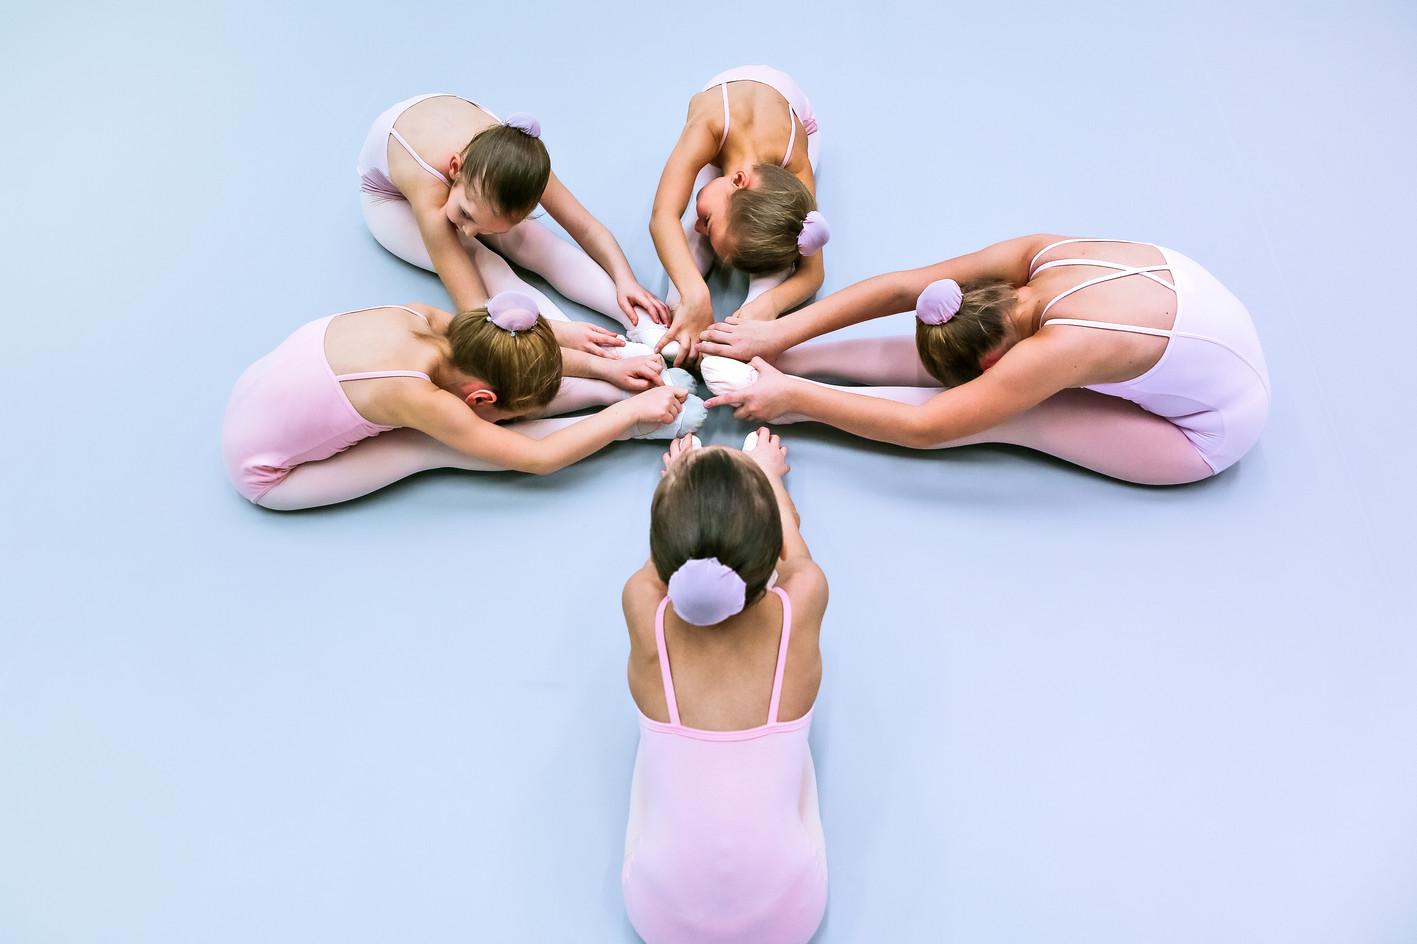 Le Premier Pas Юные балерины